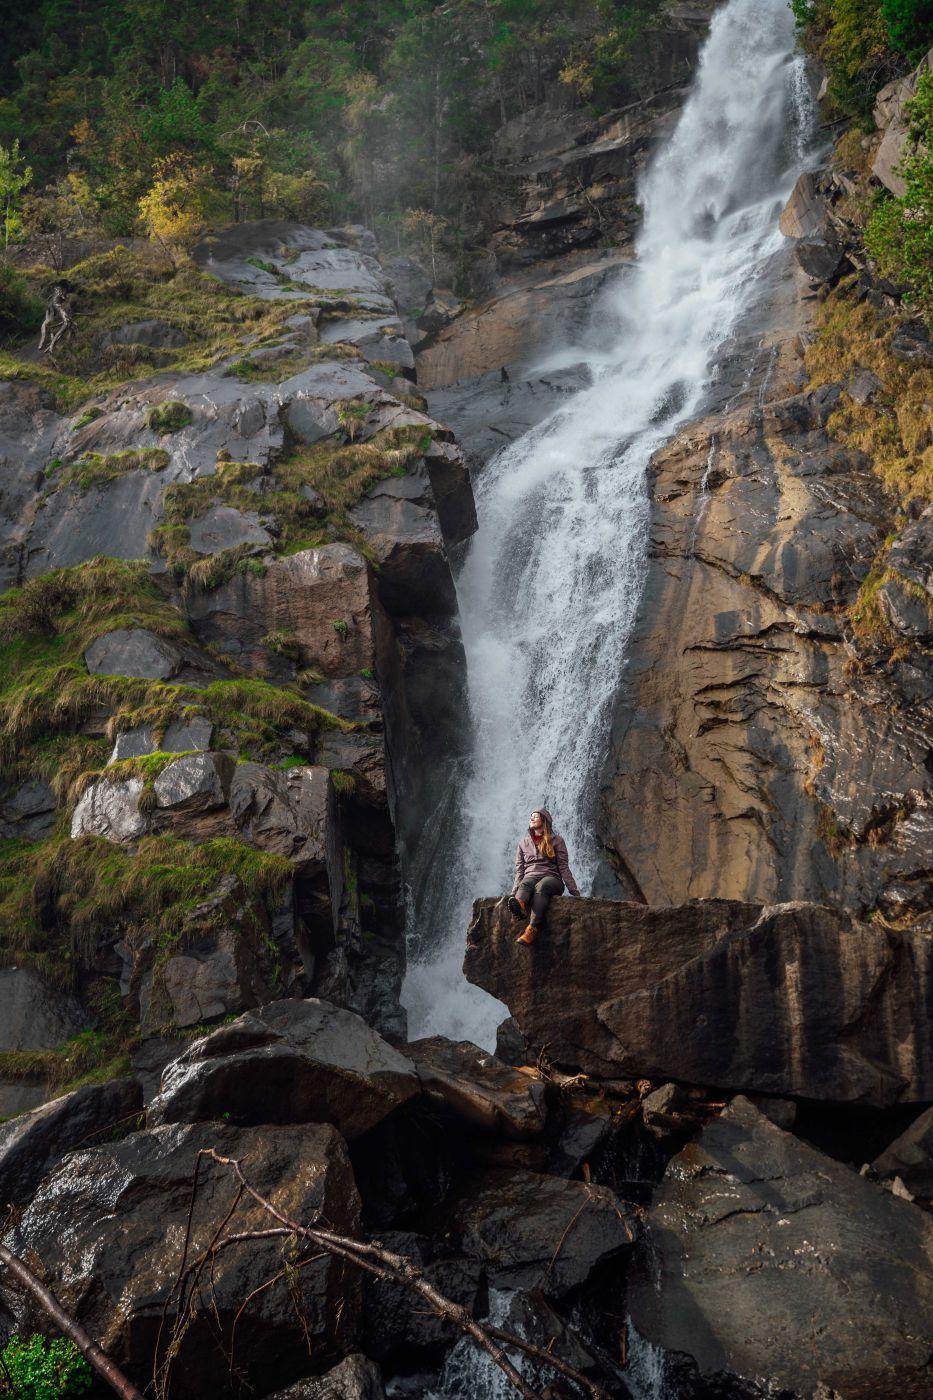 Barbian waterfall, Italy